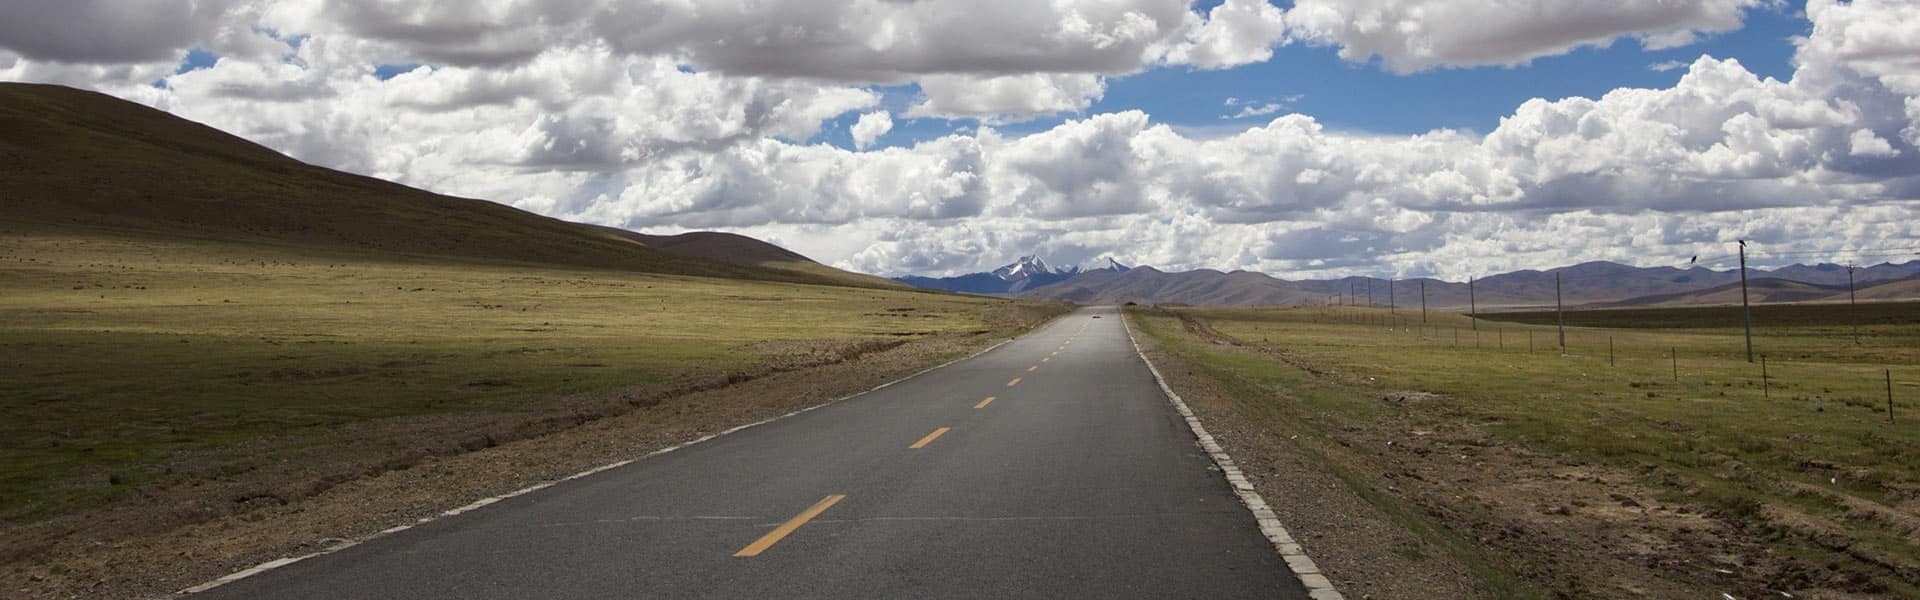 road-distance-landscape-background